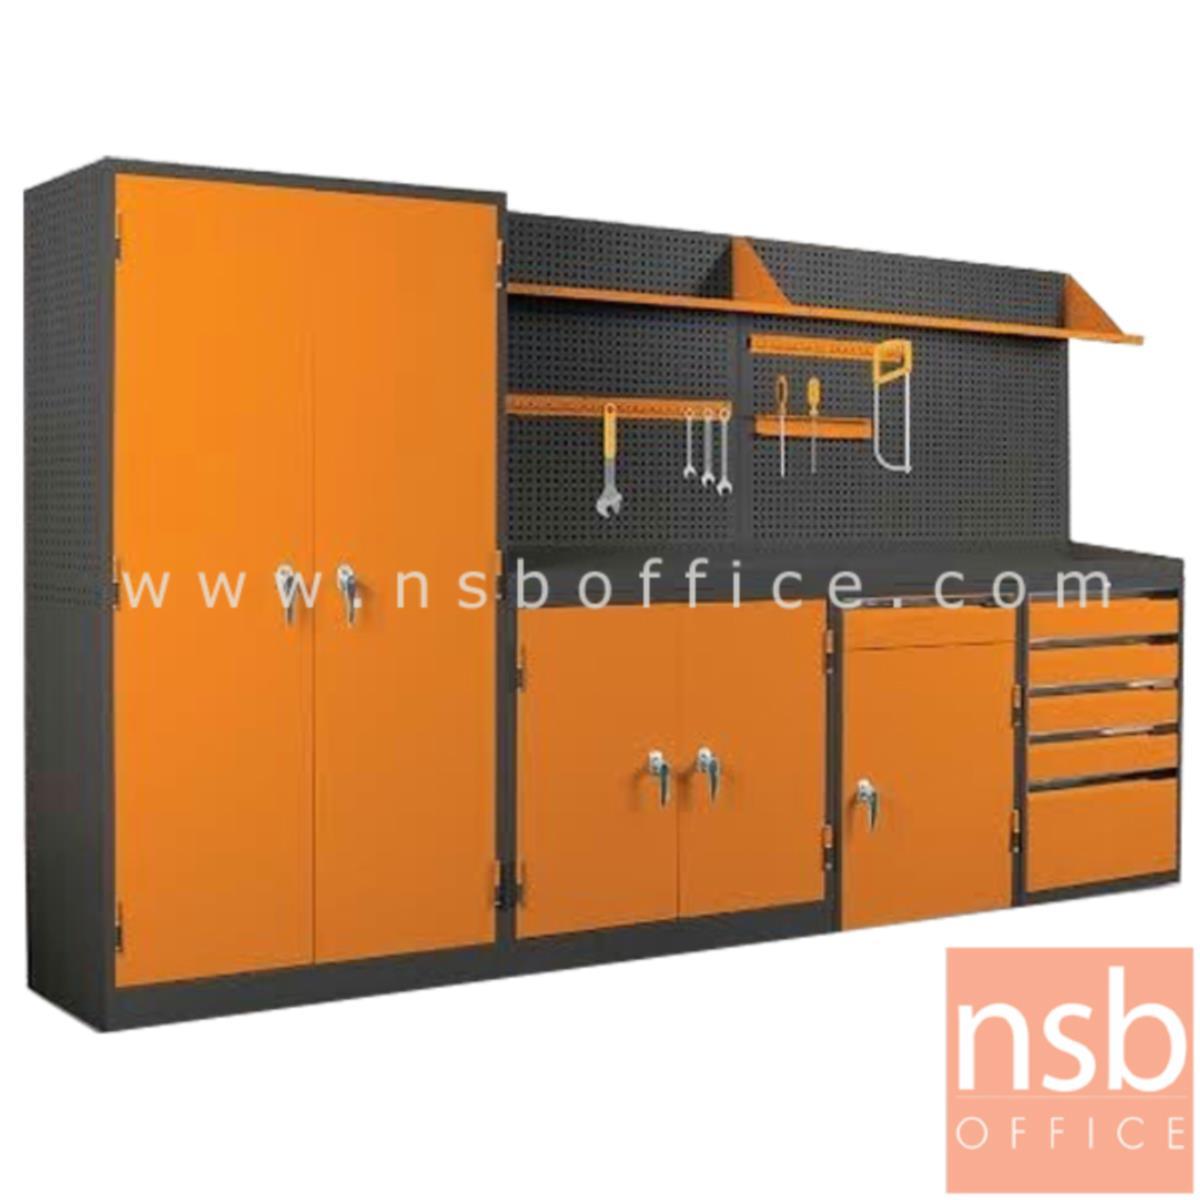 E09A024:ชุดตู้เก็บเครื่องมือช่าง 307W*49.7D*183H cm. พร้อมแผ่นท็อปแผ่นชั้นและอุปกรณ์เสริม